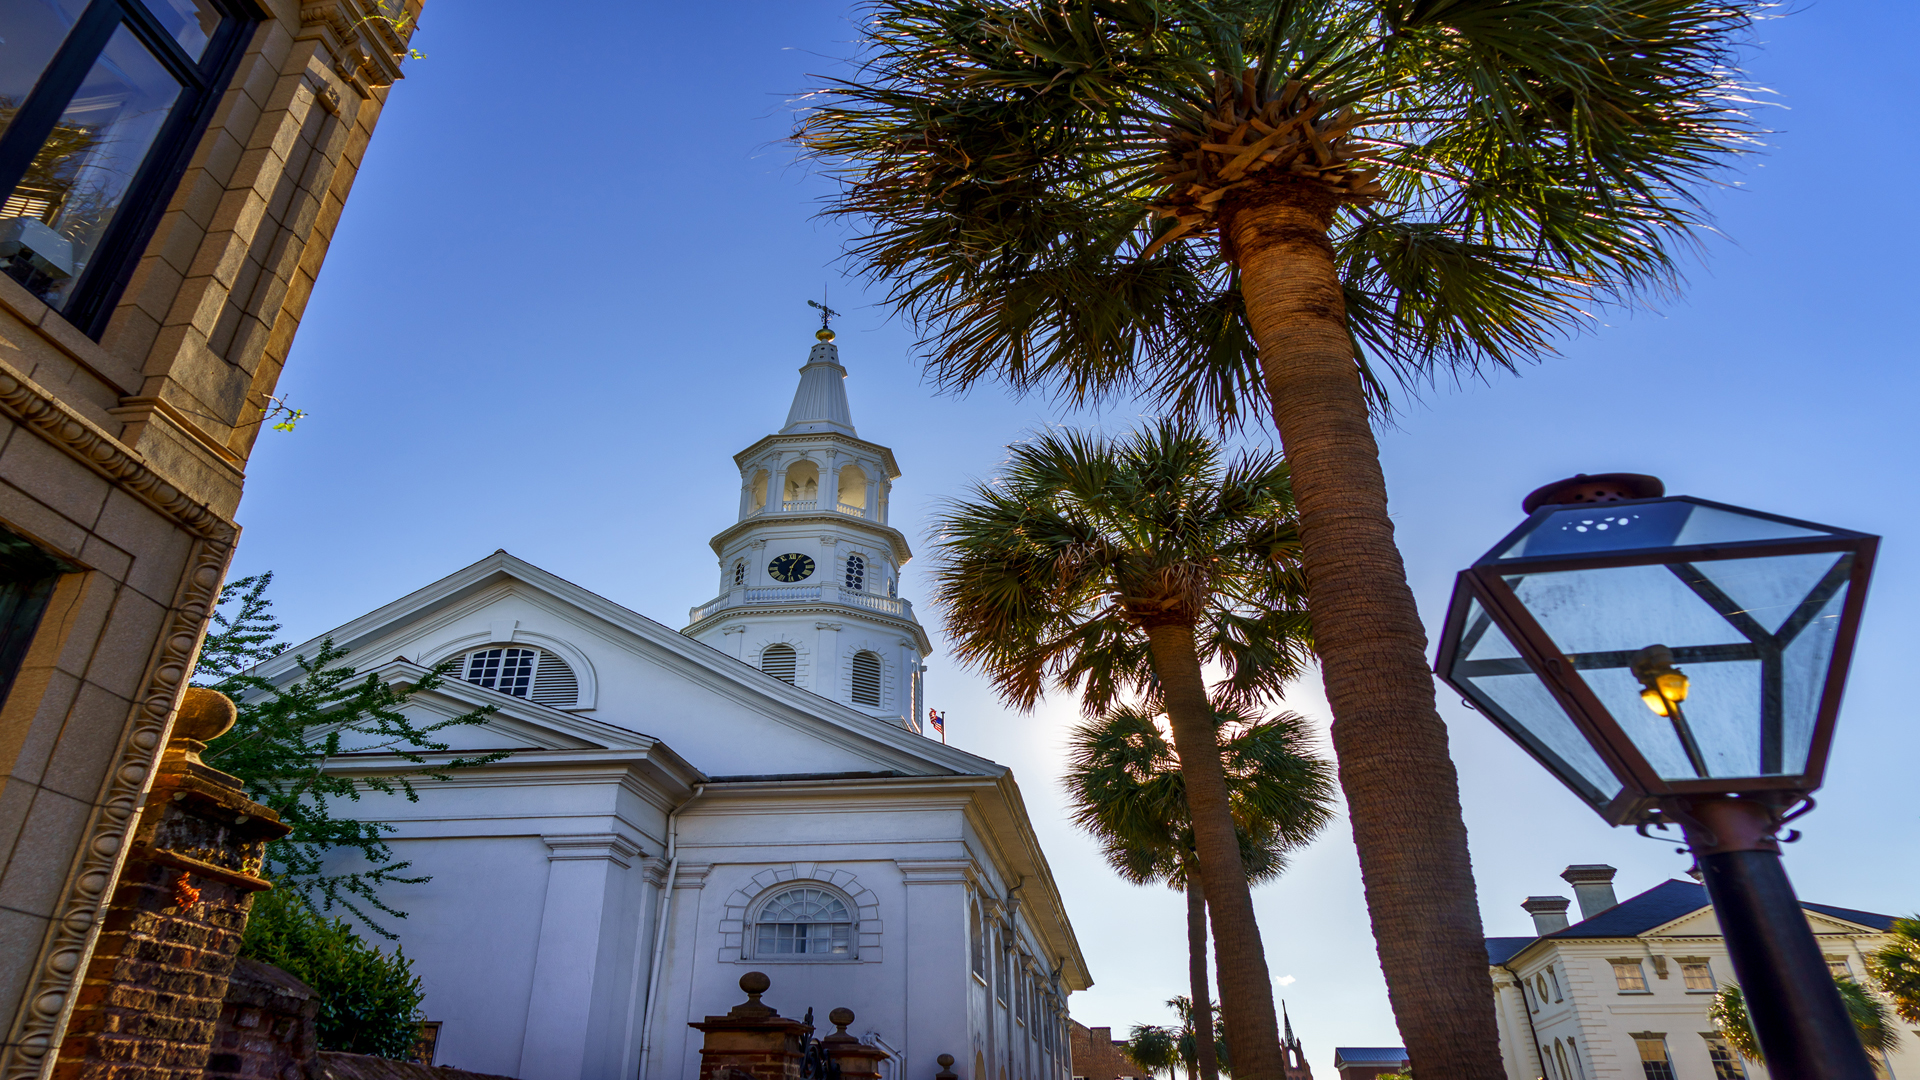 CharlestonBldgs9a